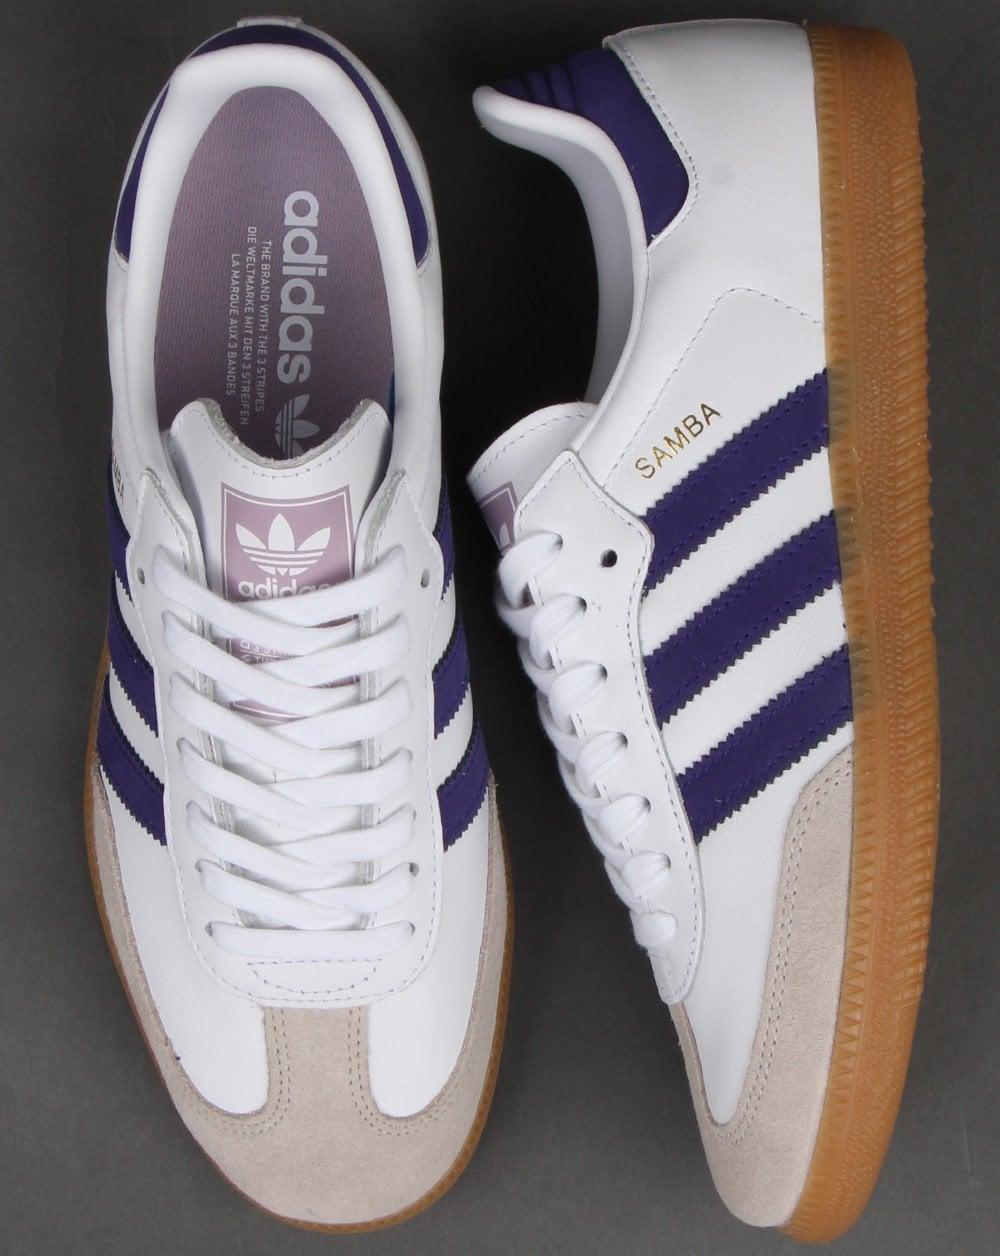 Adidas Samba Og Trainers White/Purple